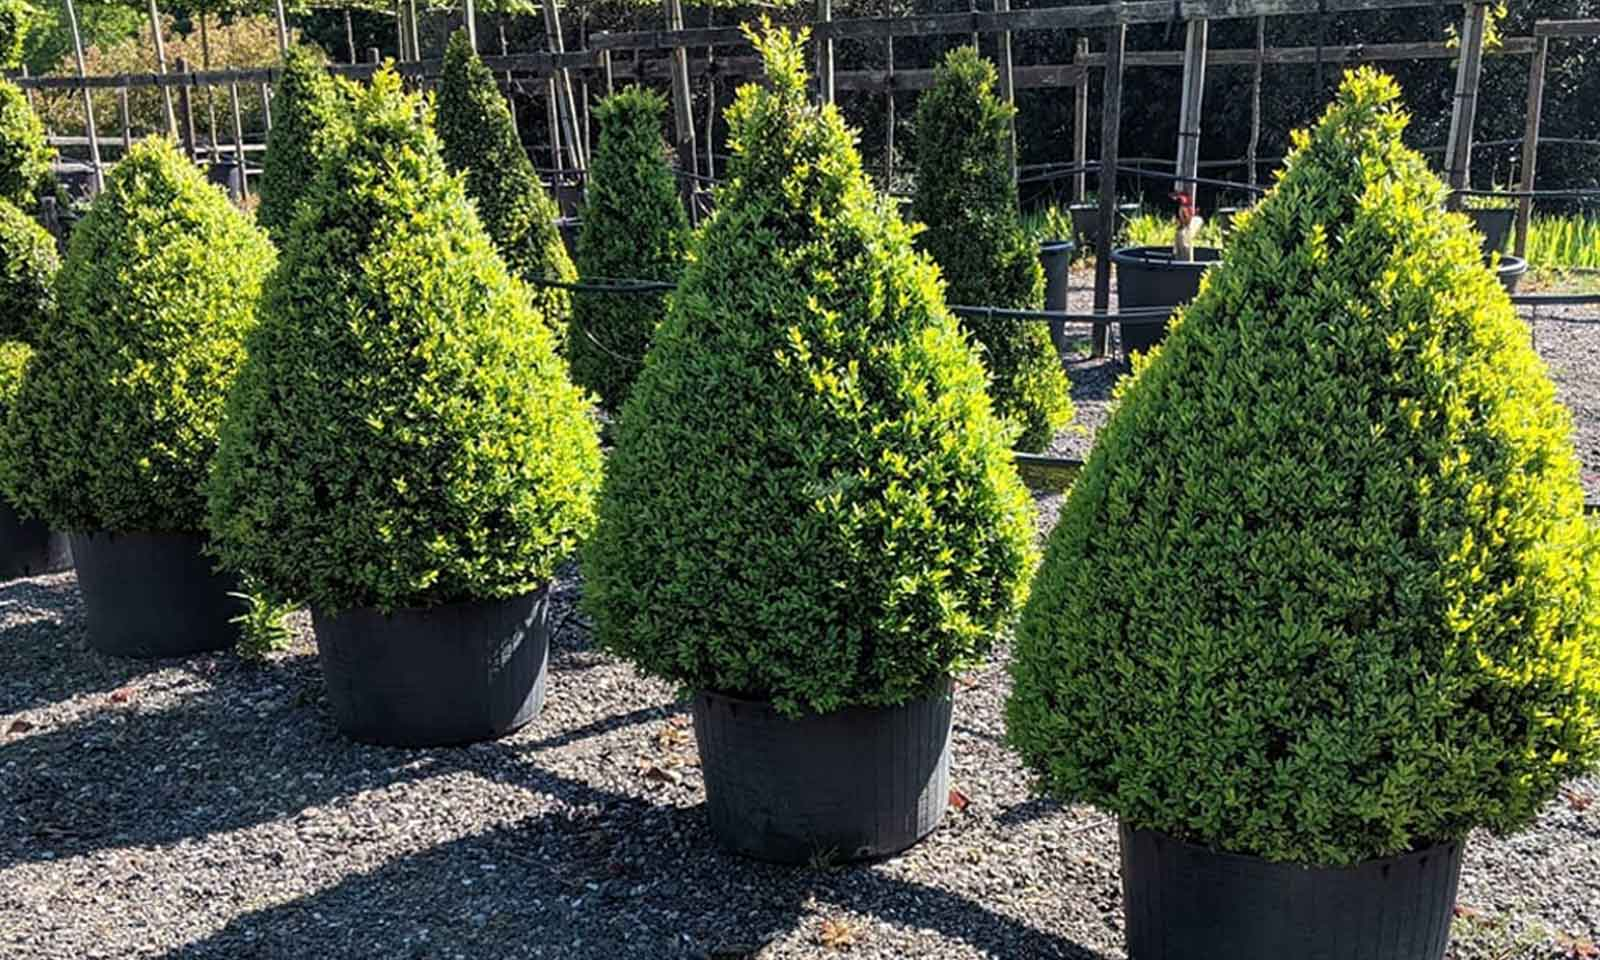 Buxus Microphylla Faulkner (Box Faulkner) - Cone